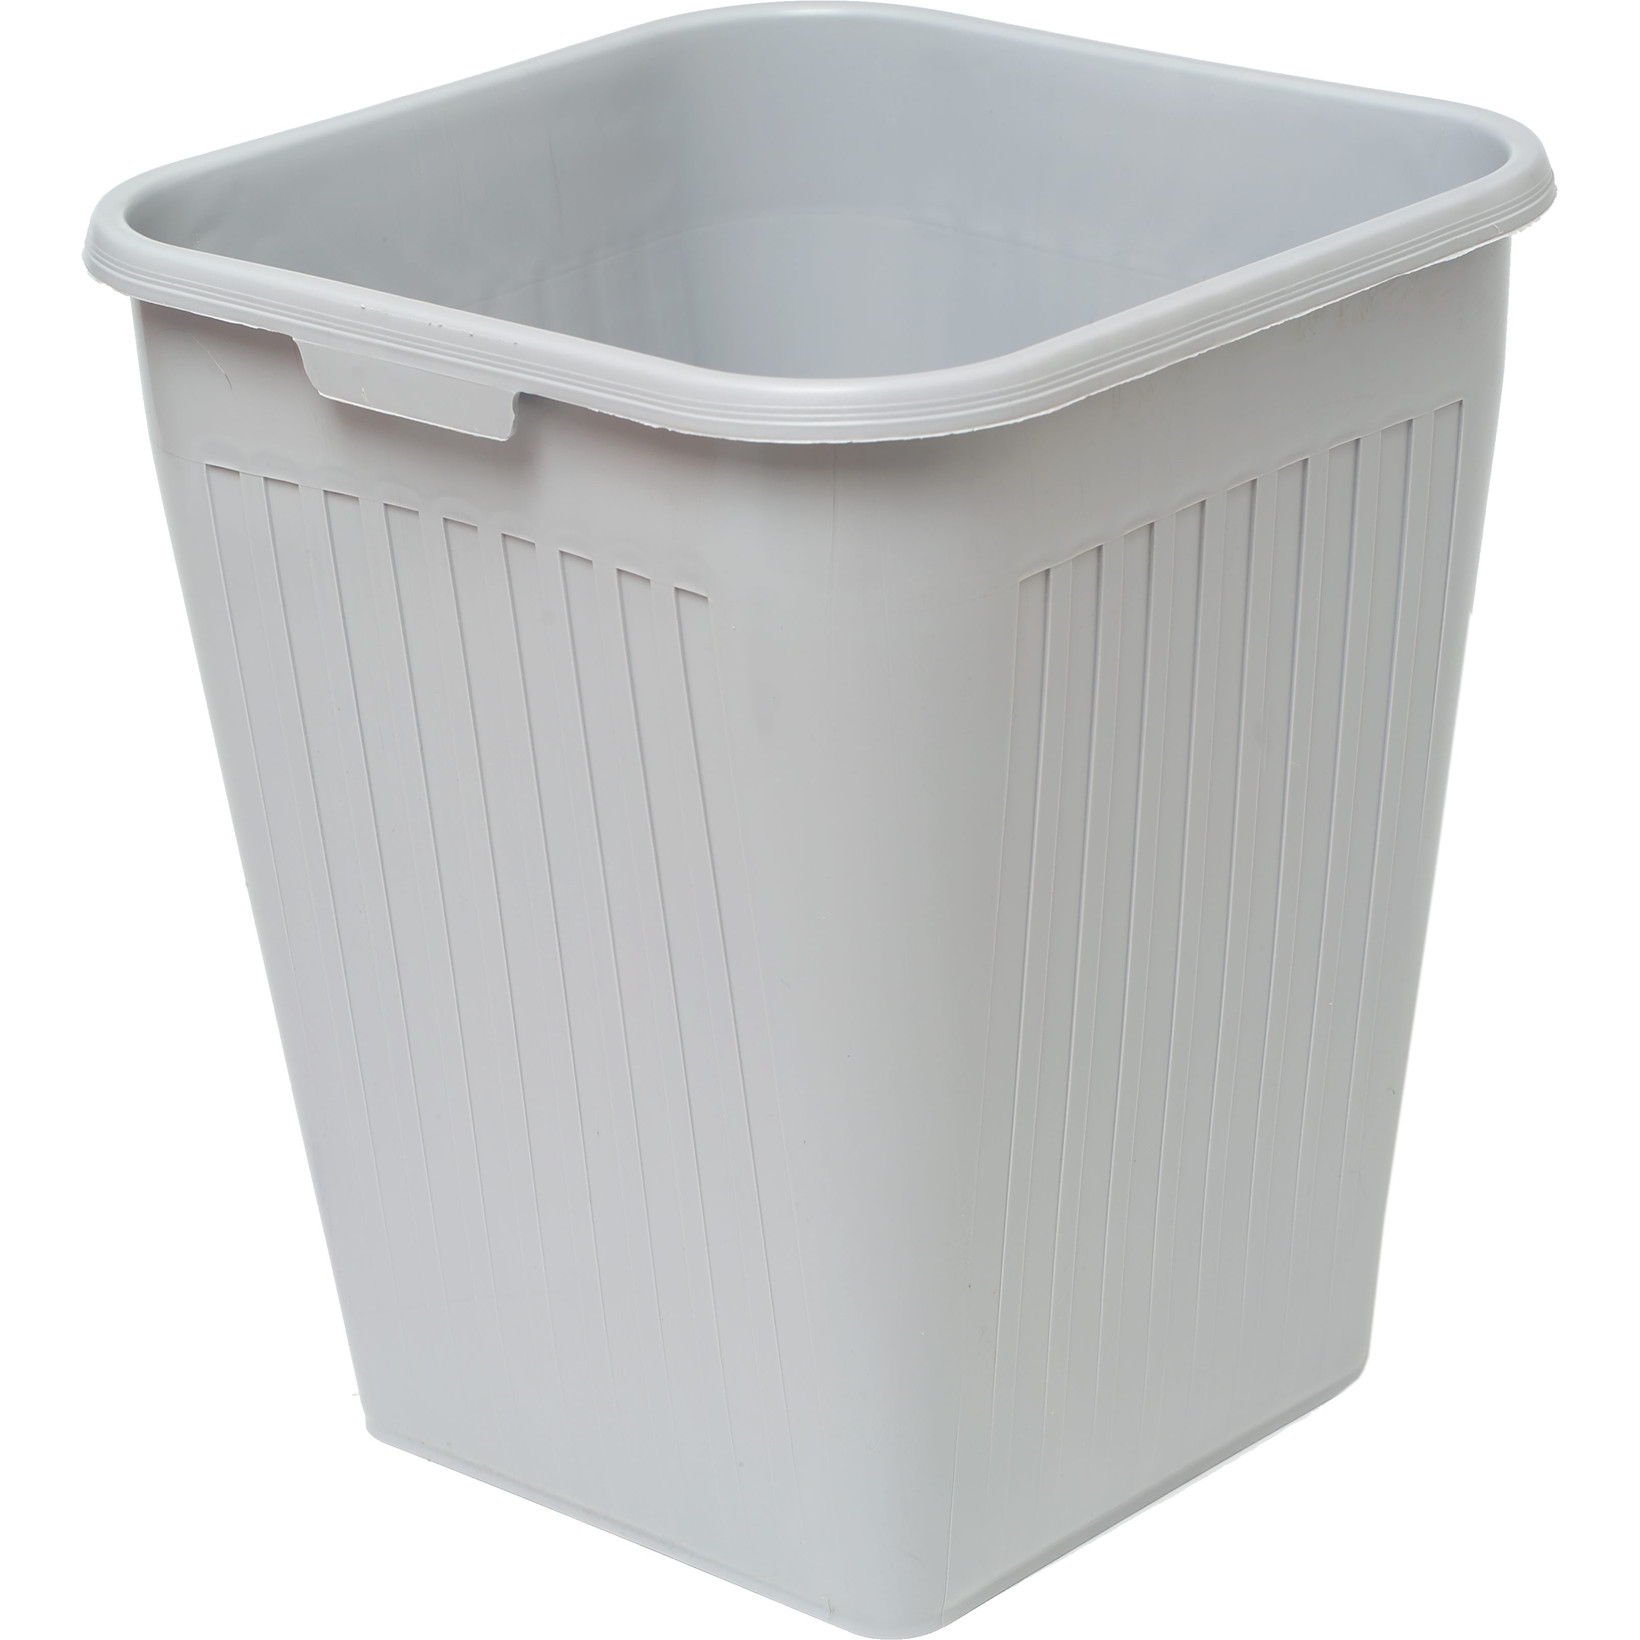 Orth Papirkurv 25 liter -  Firkantet grå plast